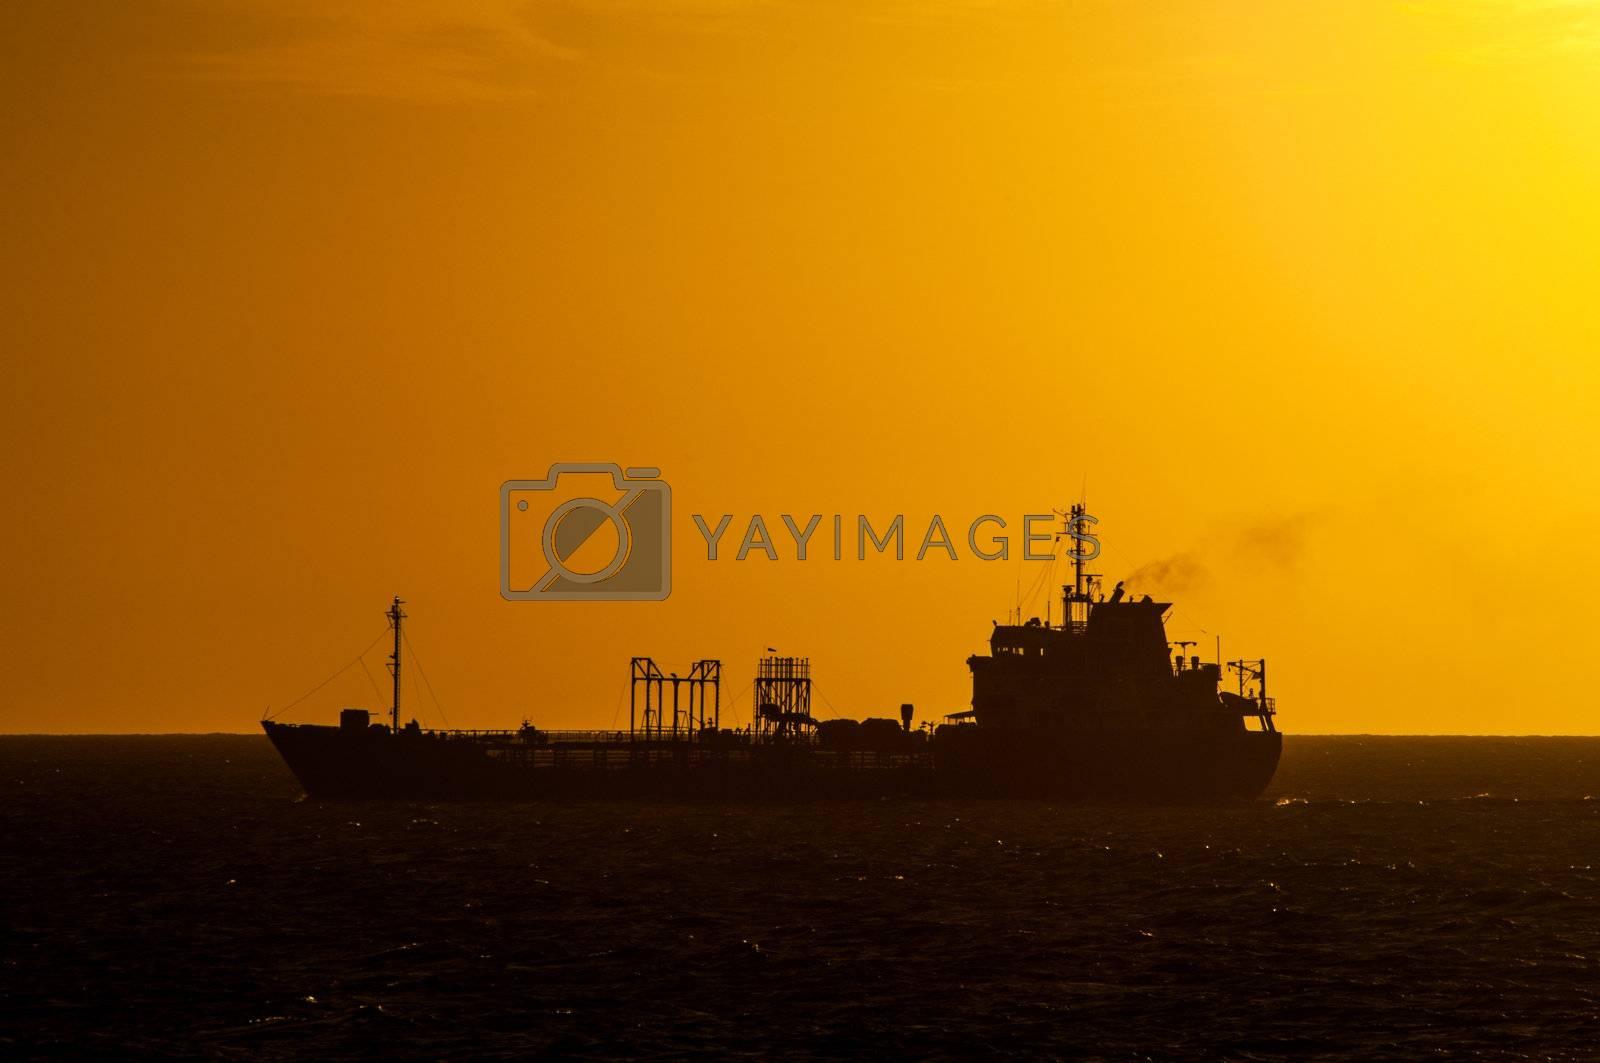 Dark Boat Silhouette at Sunset by jkraft5